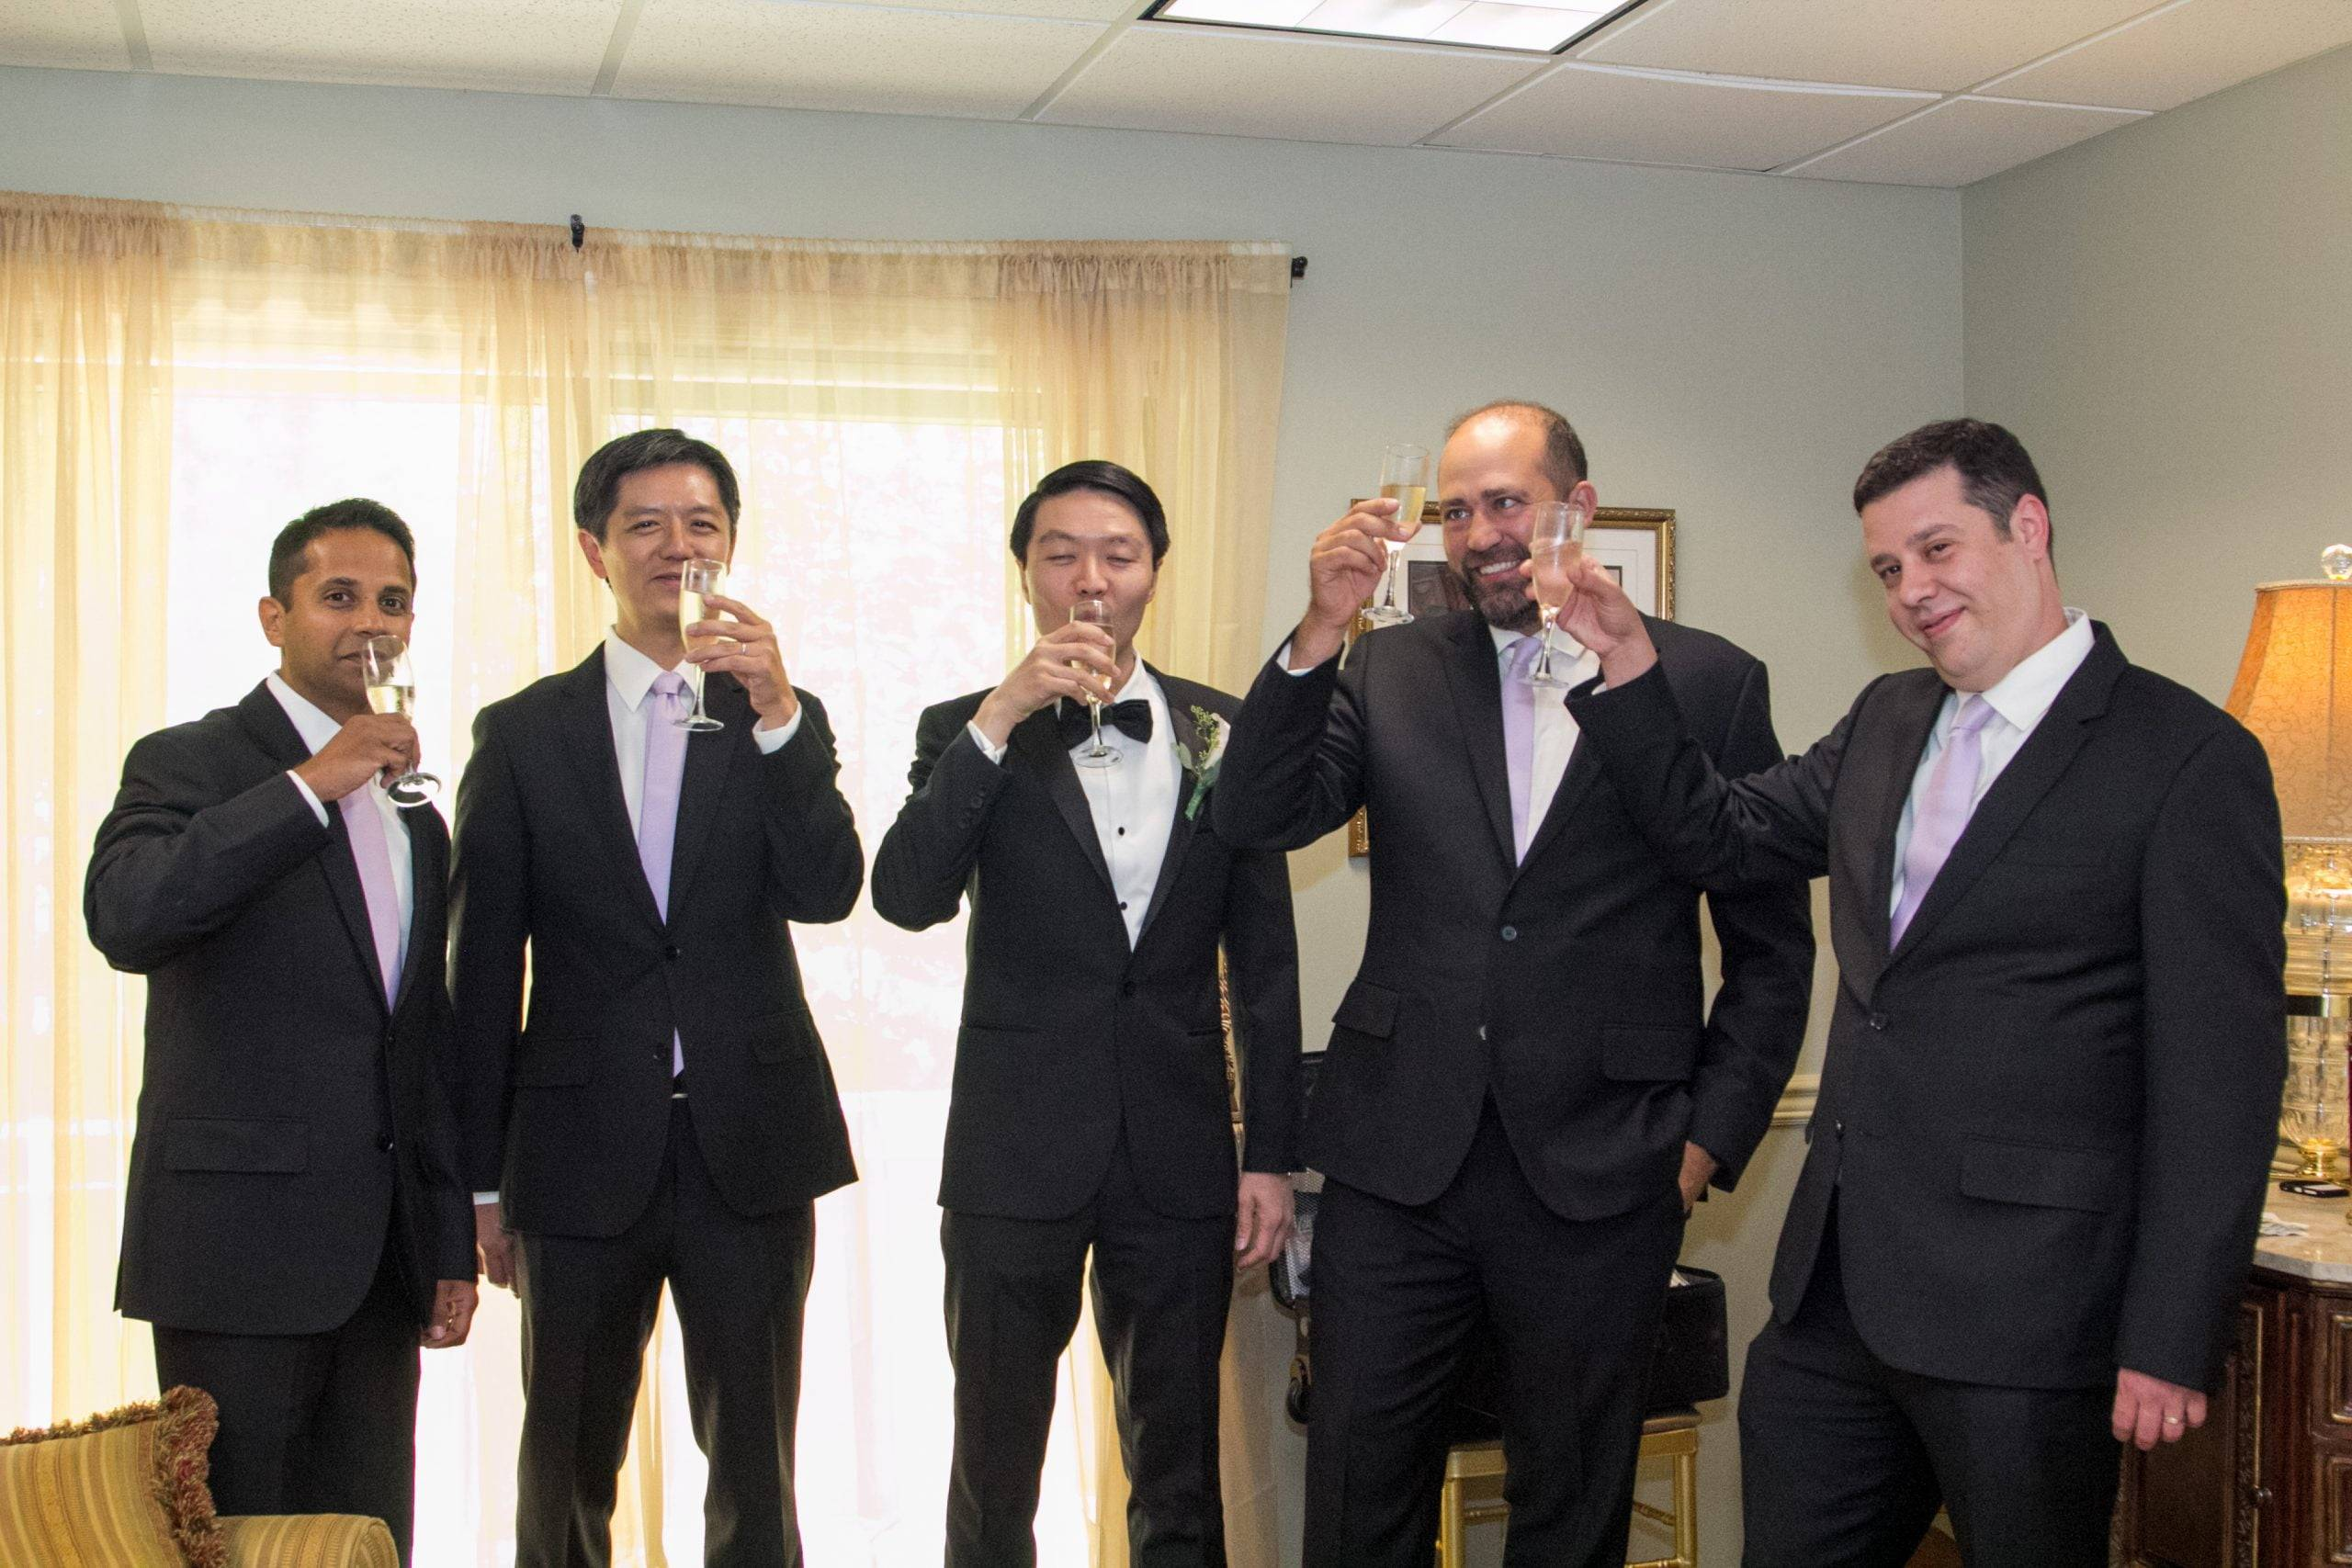 Brooklake groomsmen ready for the wedding